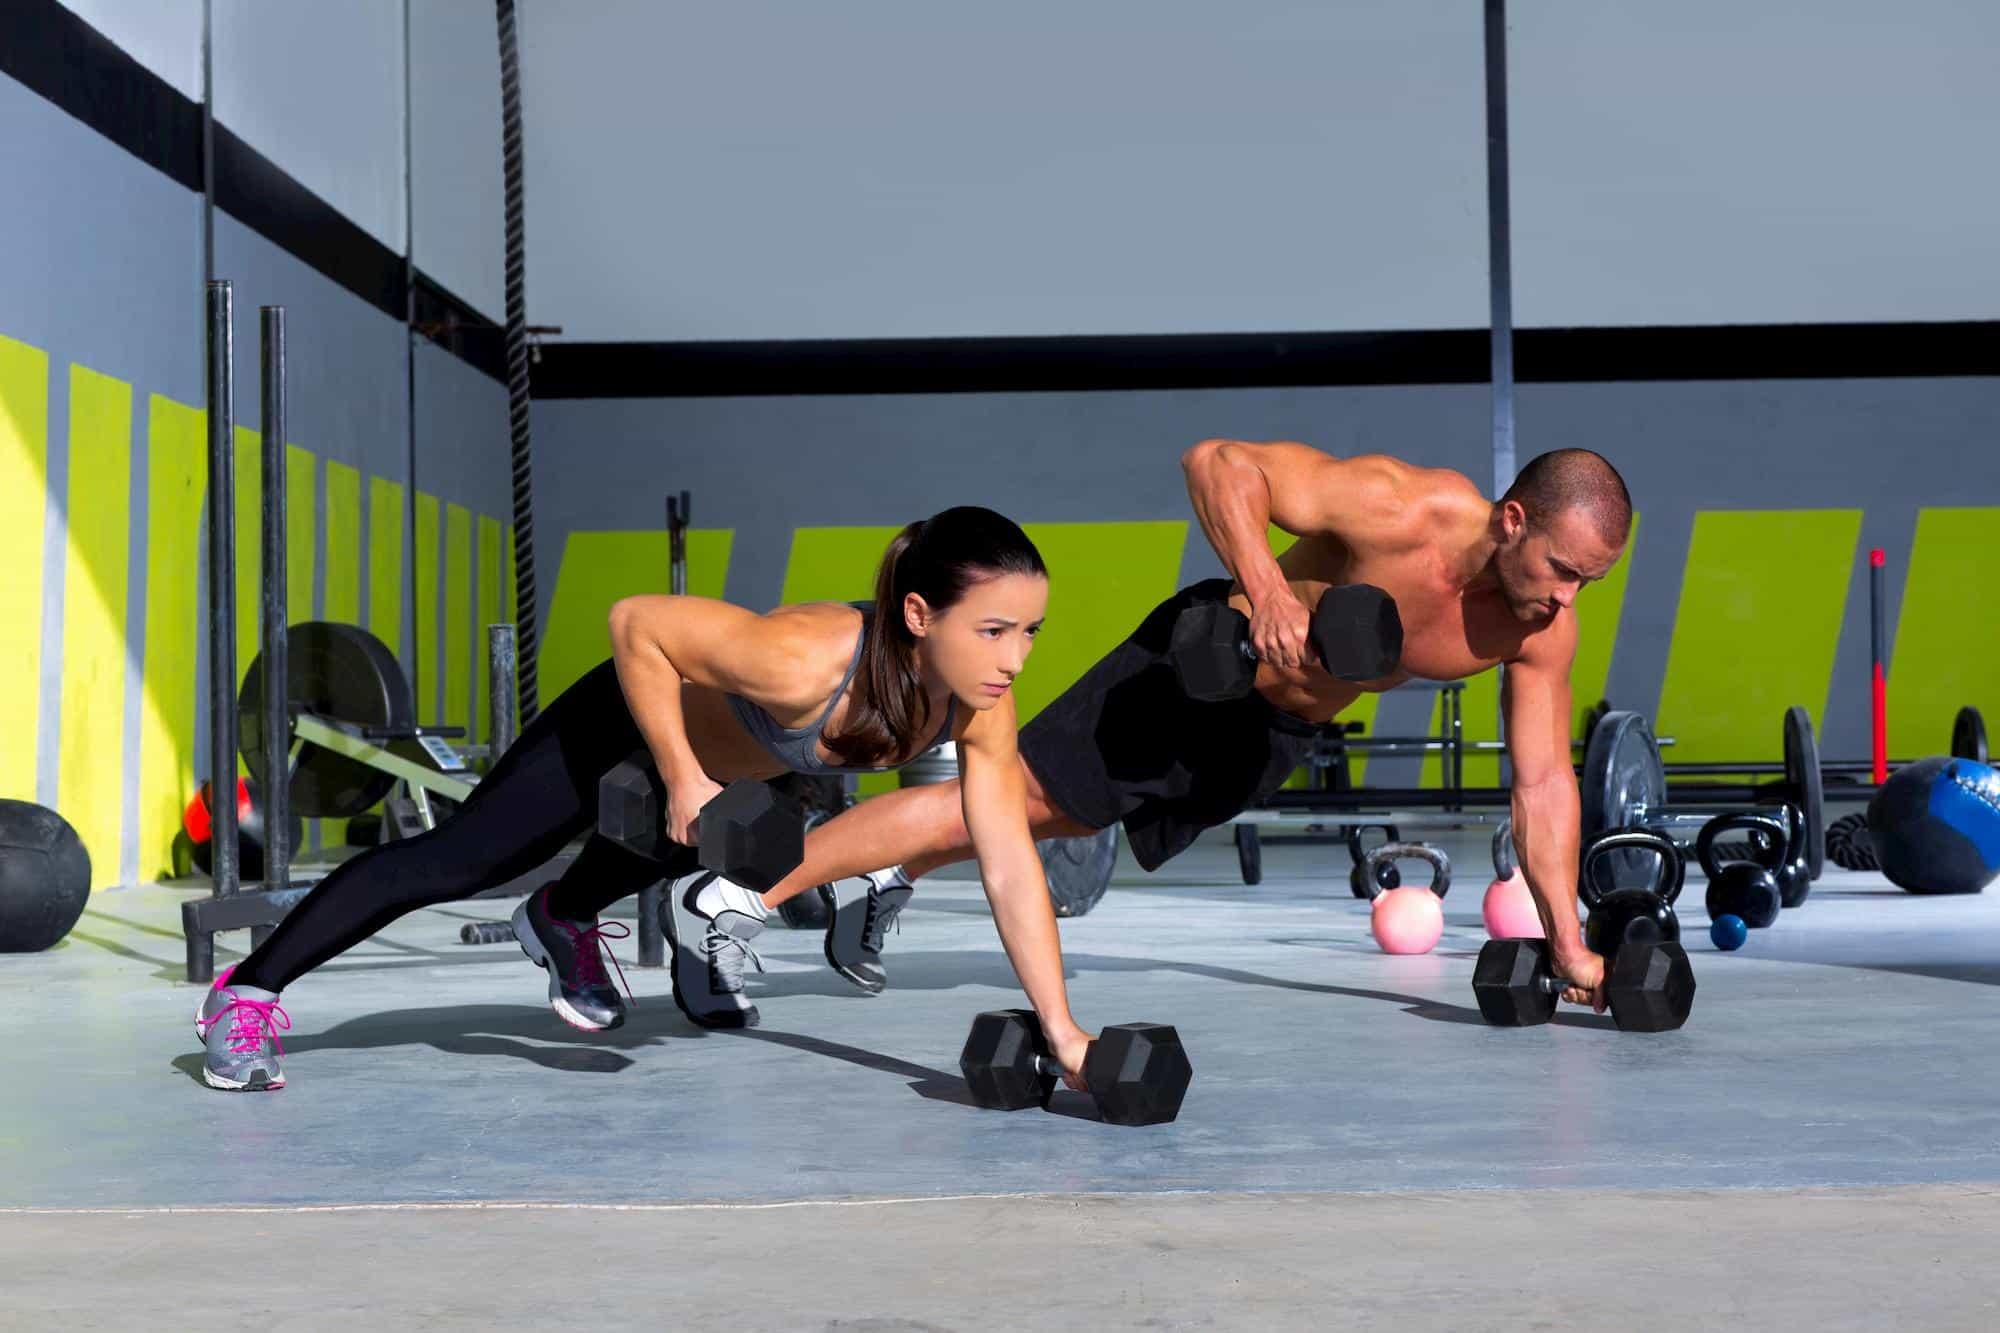 Man and woman doing push ups